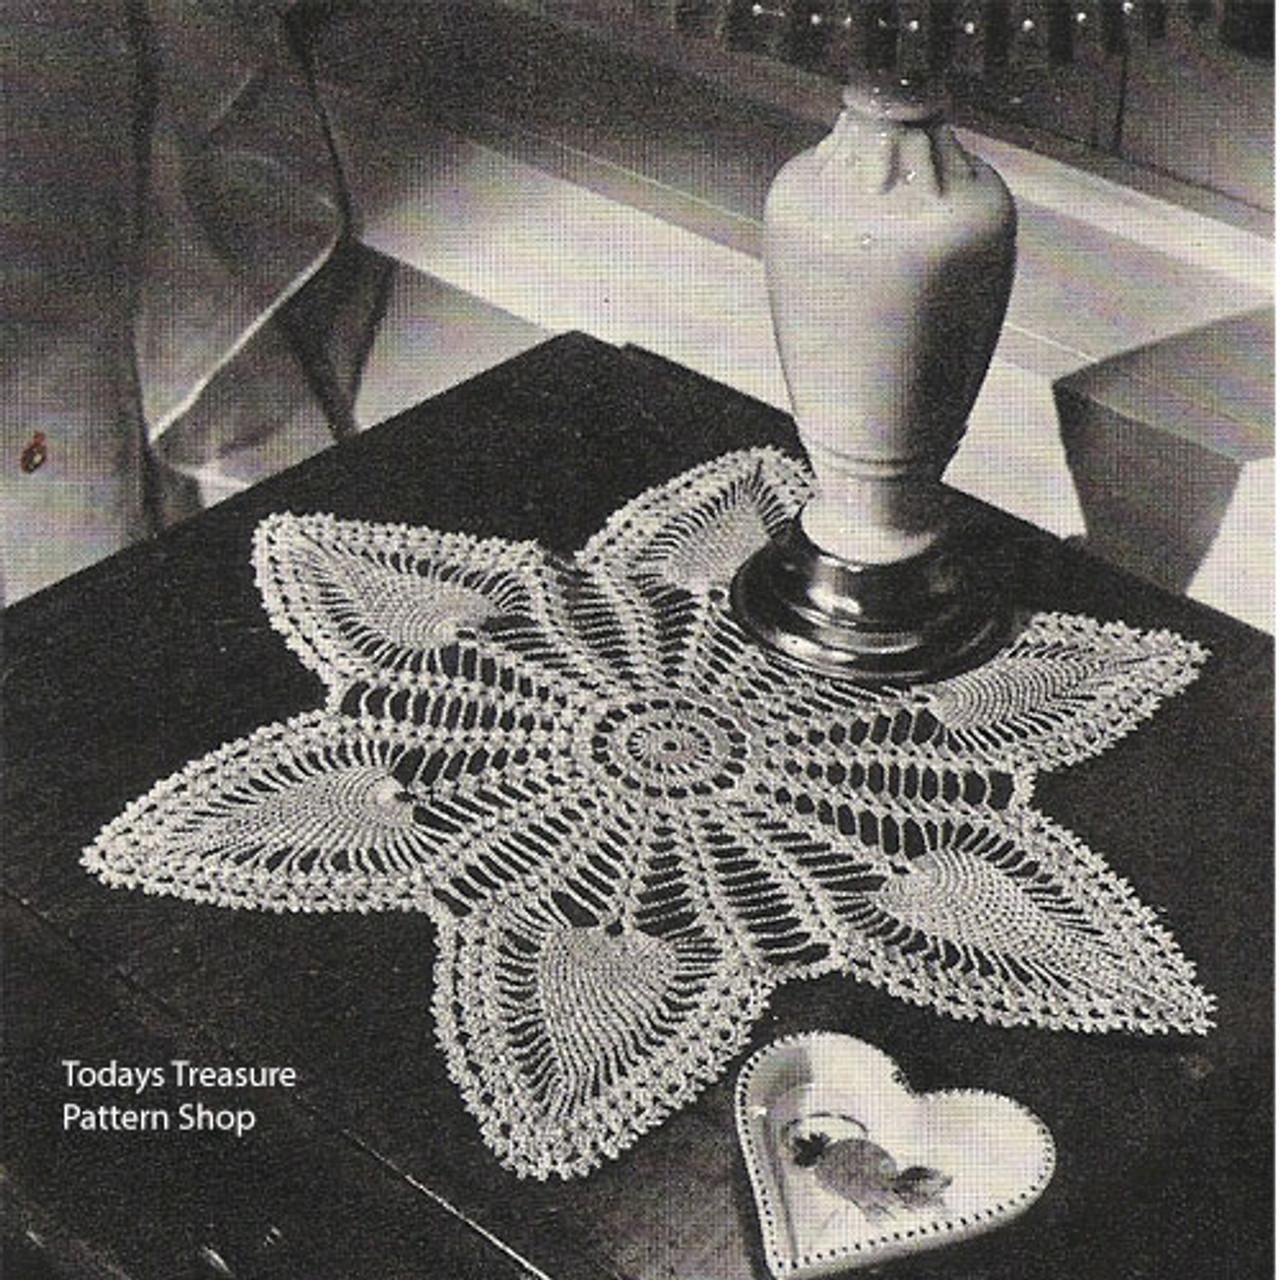 Pineapple Petals Vintage Crochet Doily Pattern